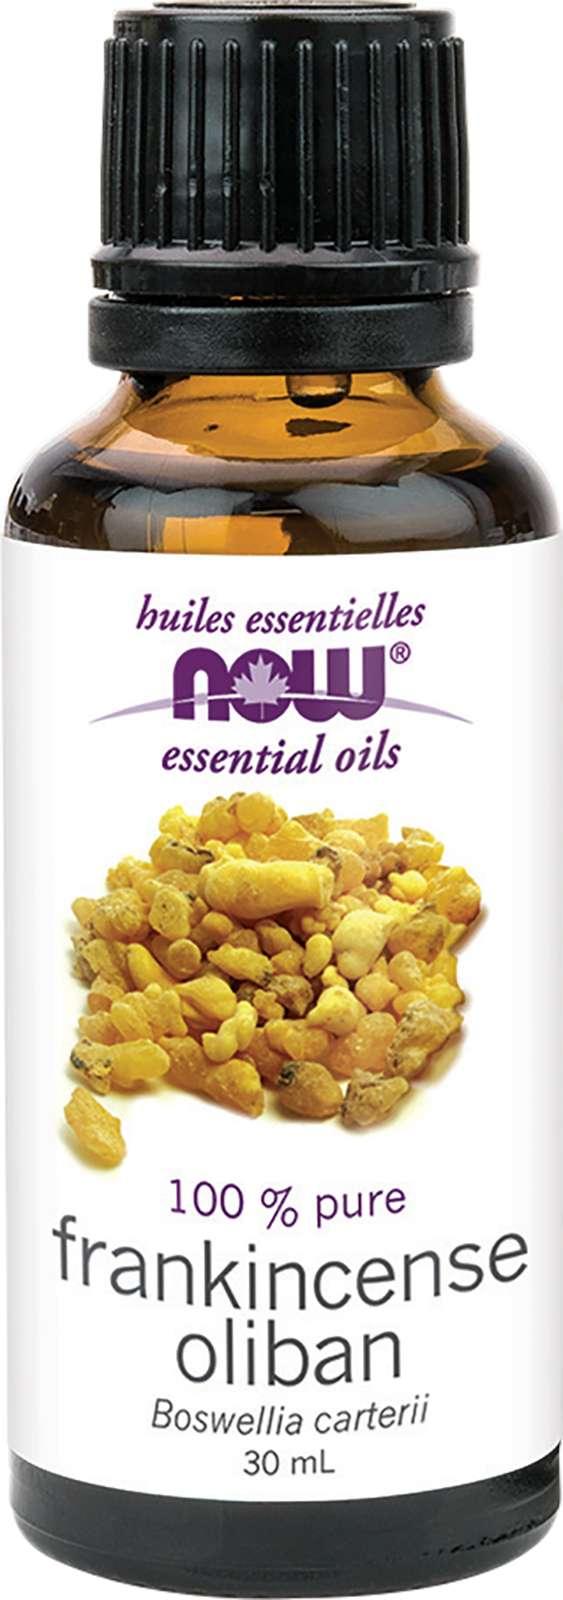 Frankincense Oil (Boswellia carterii) 30mL